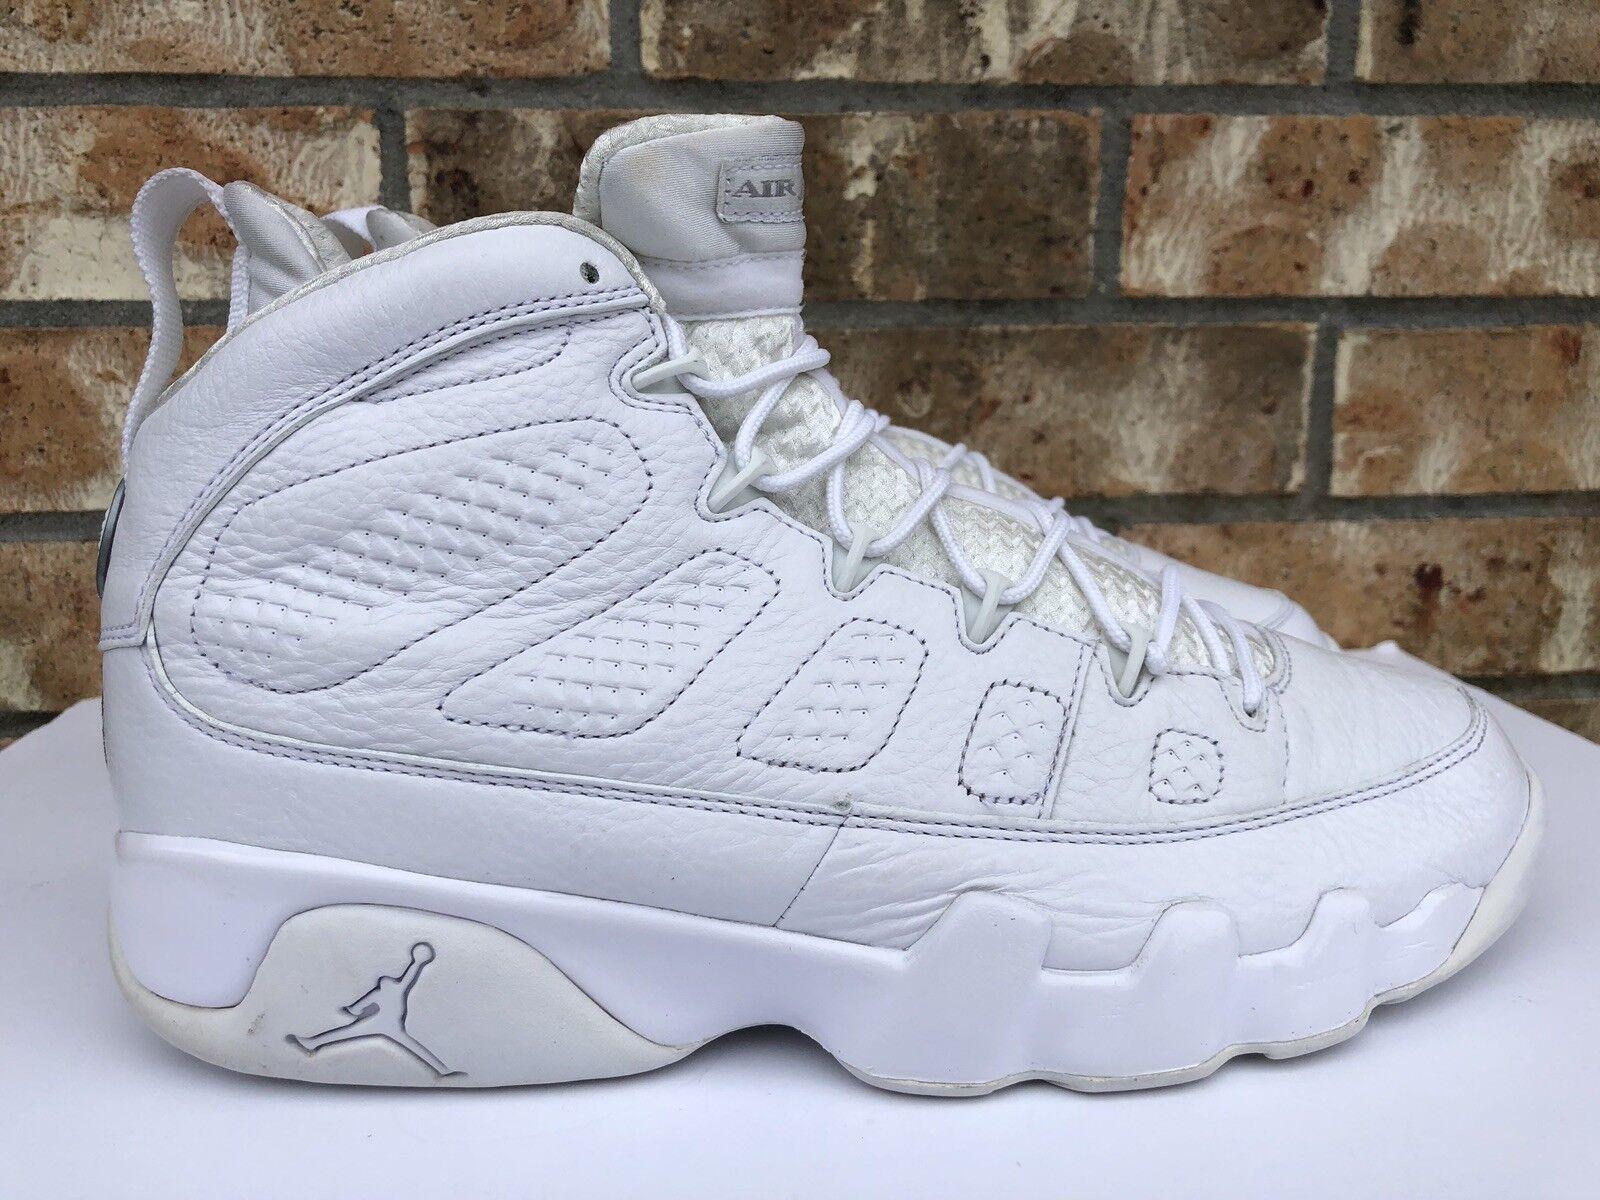 Men's Nike Air Jordan IX 9 Retro Silver 25th Anniversary Pure White 302370 104